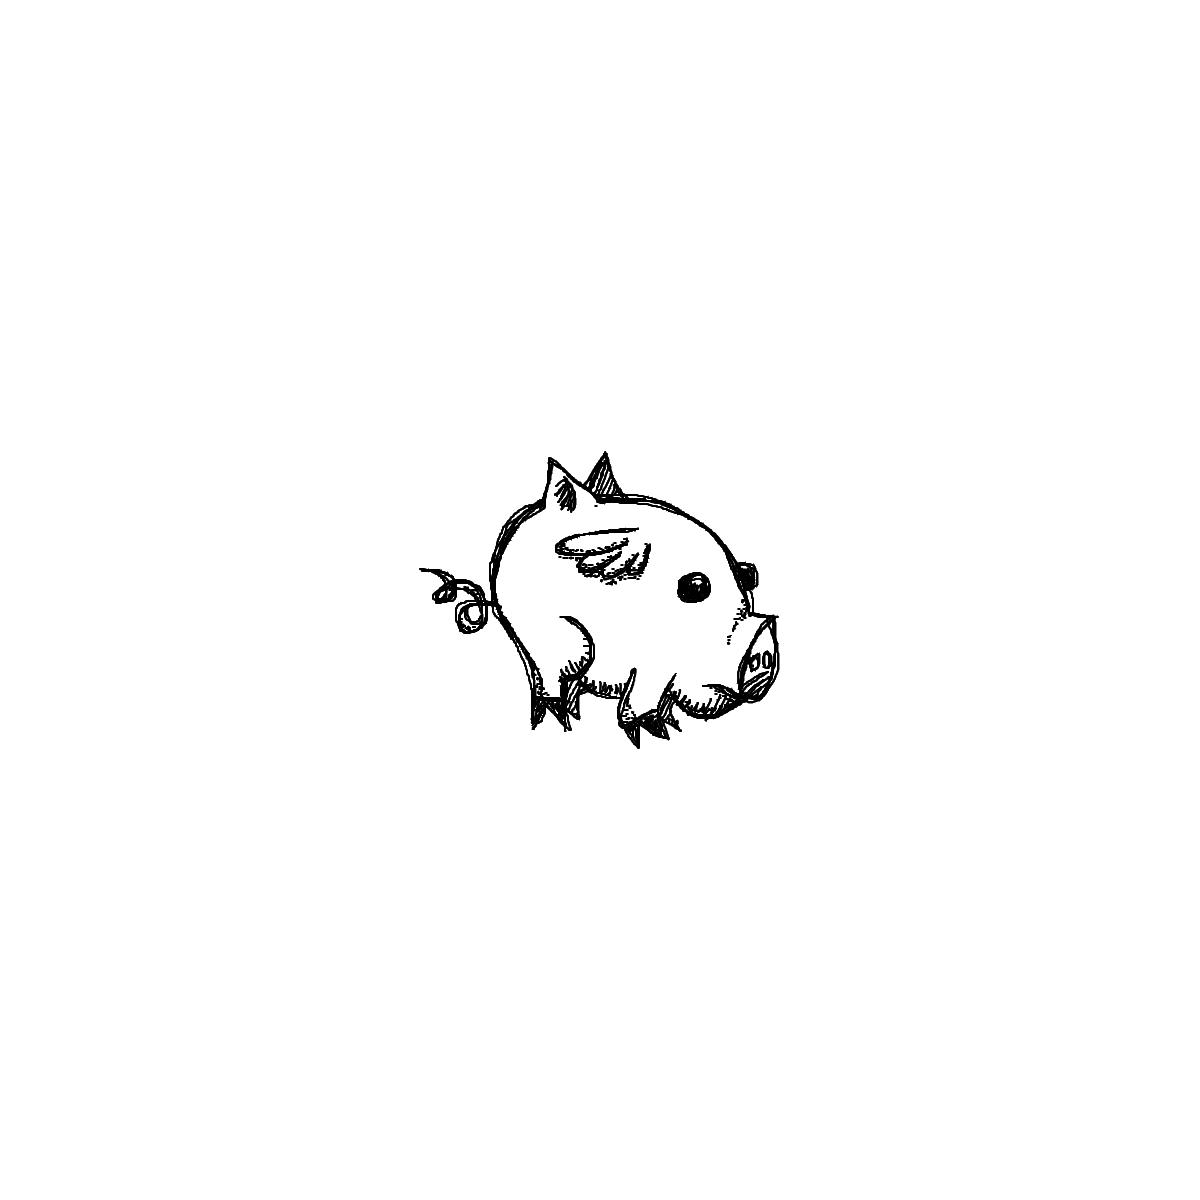 BAAAM drawing#2057 lat:43.3356819152832000lng: -1.9727985858917236